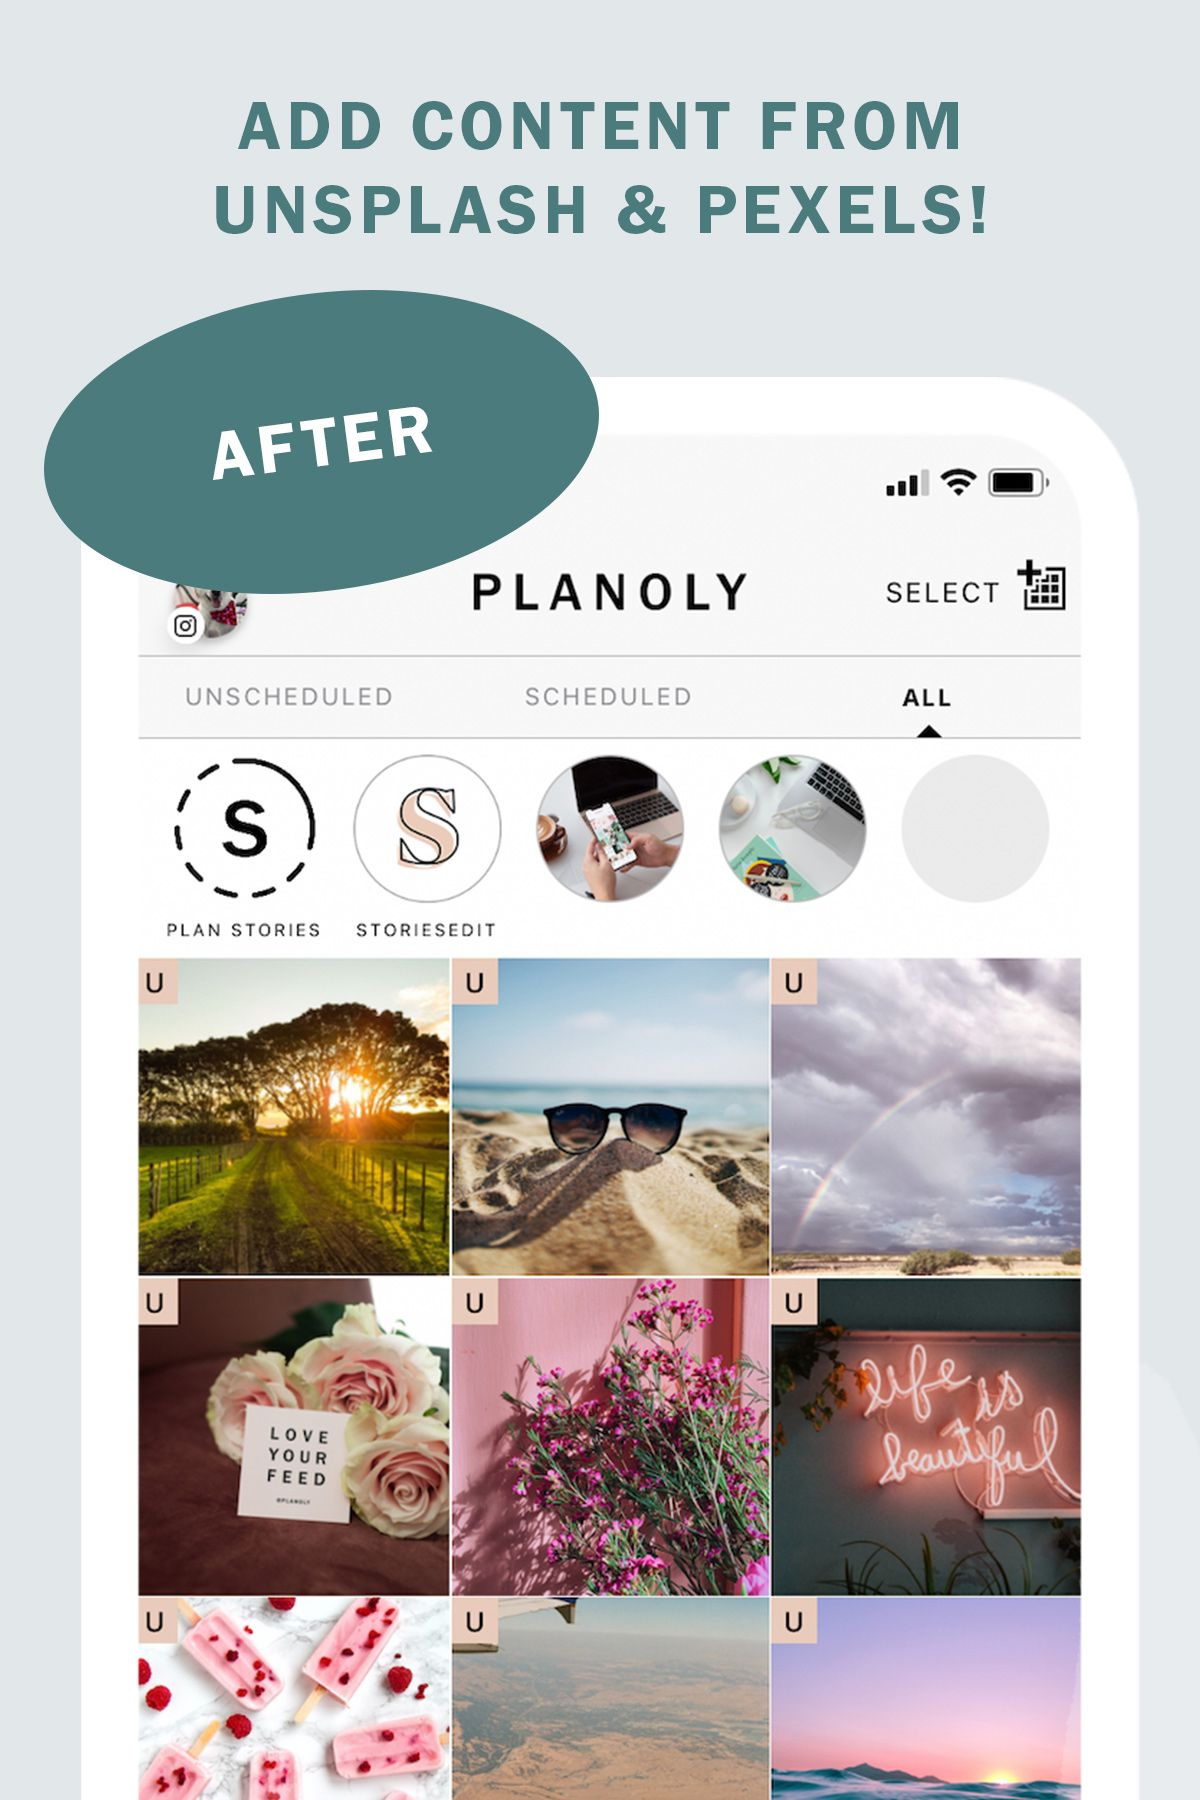 PLANOLY-Canva, Unsplash, Pexels Soft Launch-Blog Img 2-1